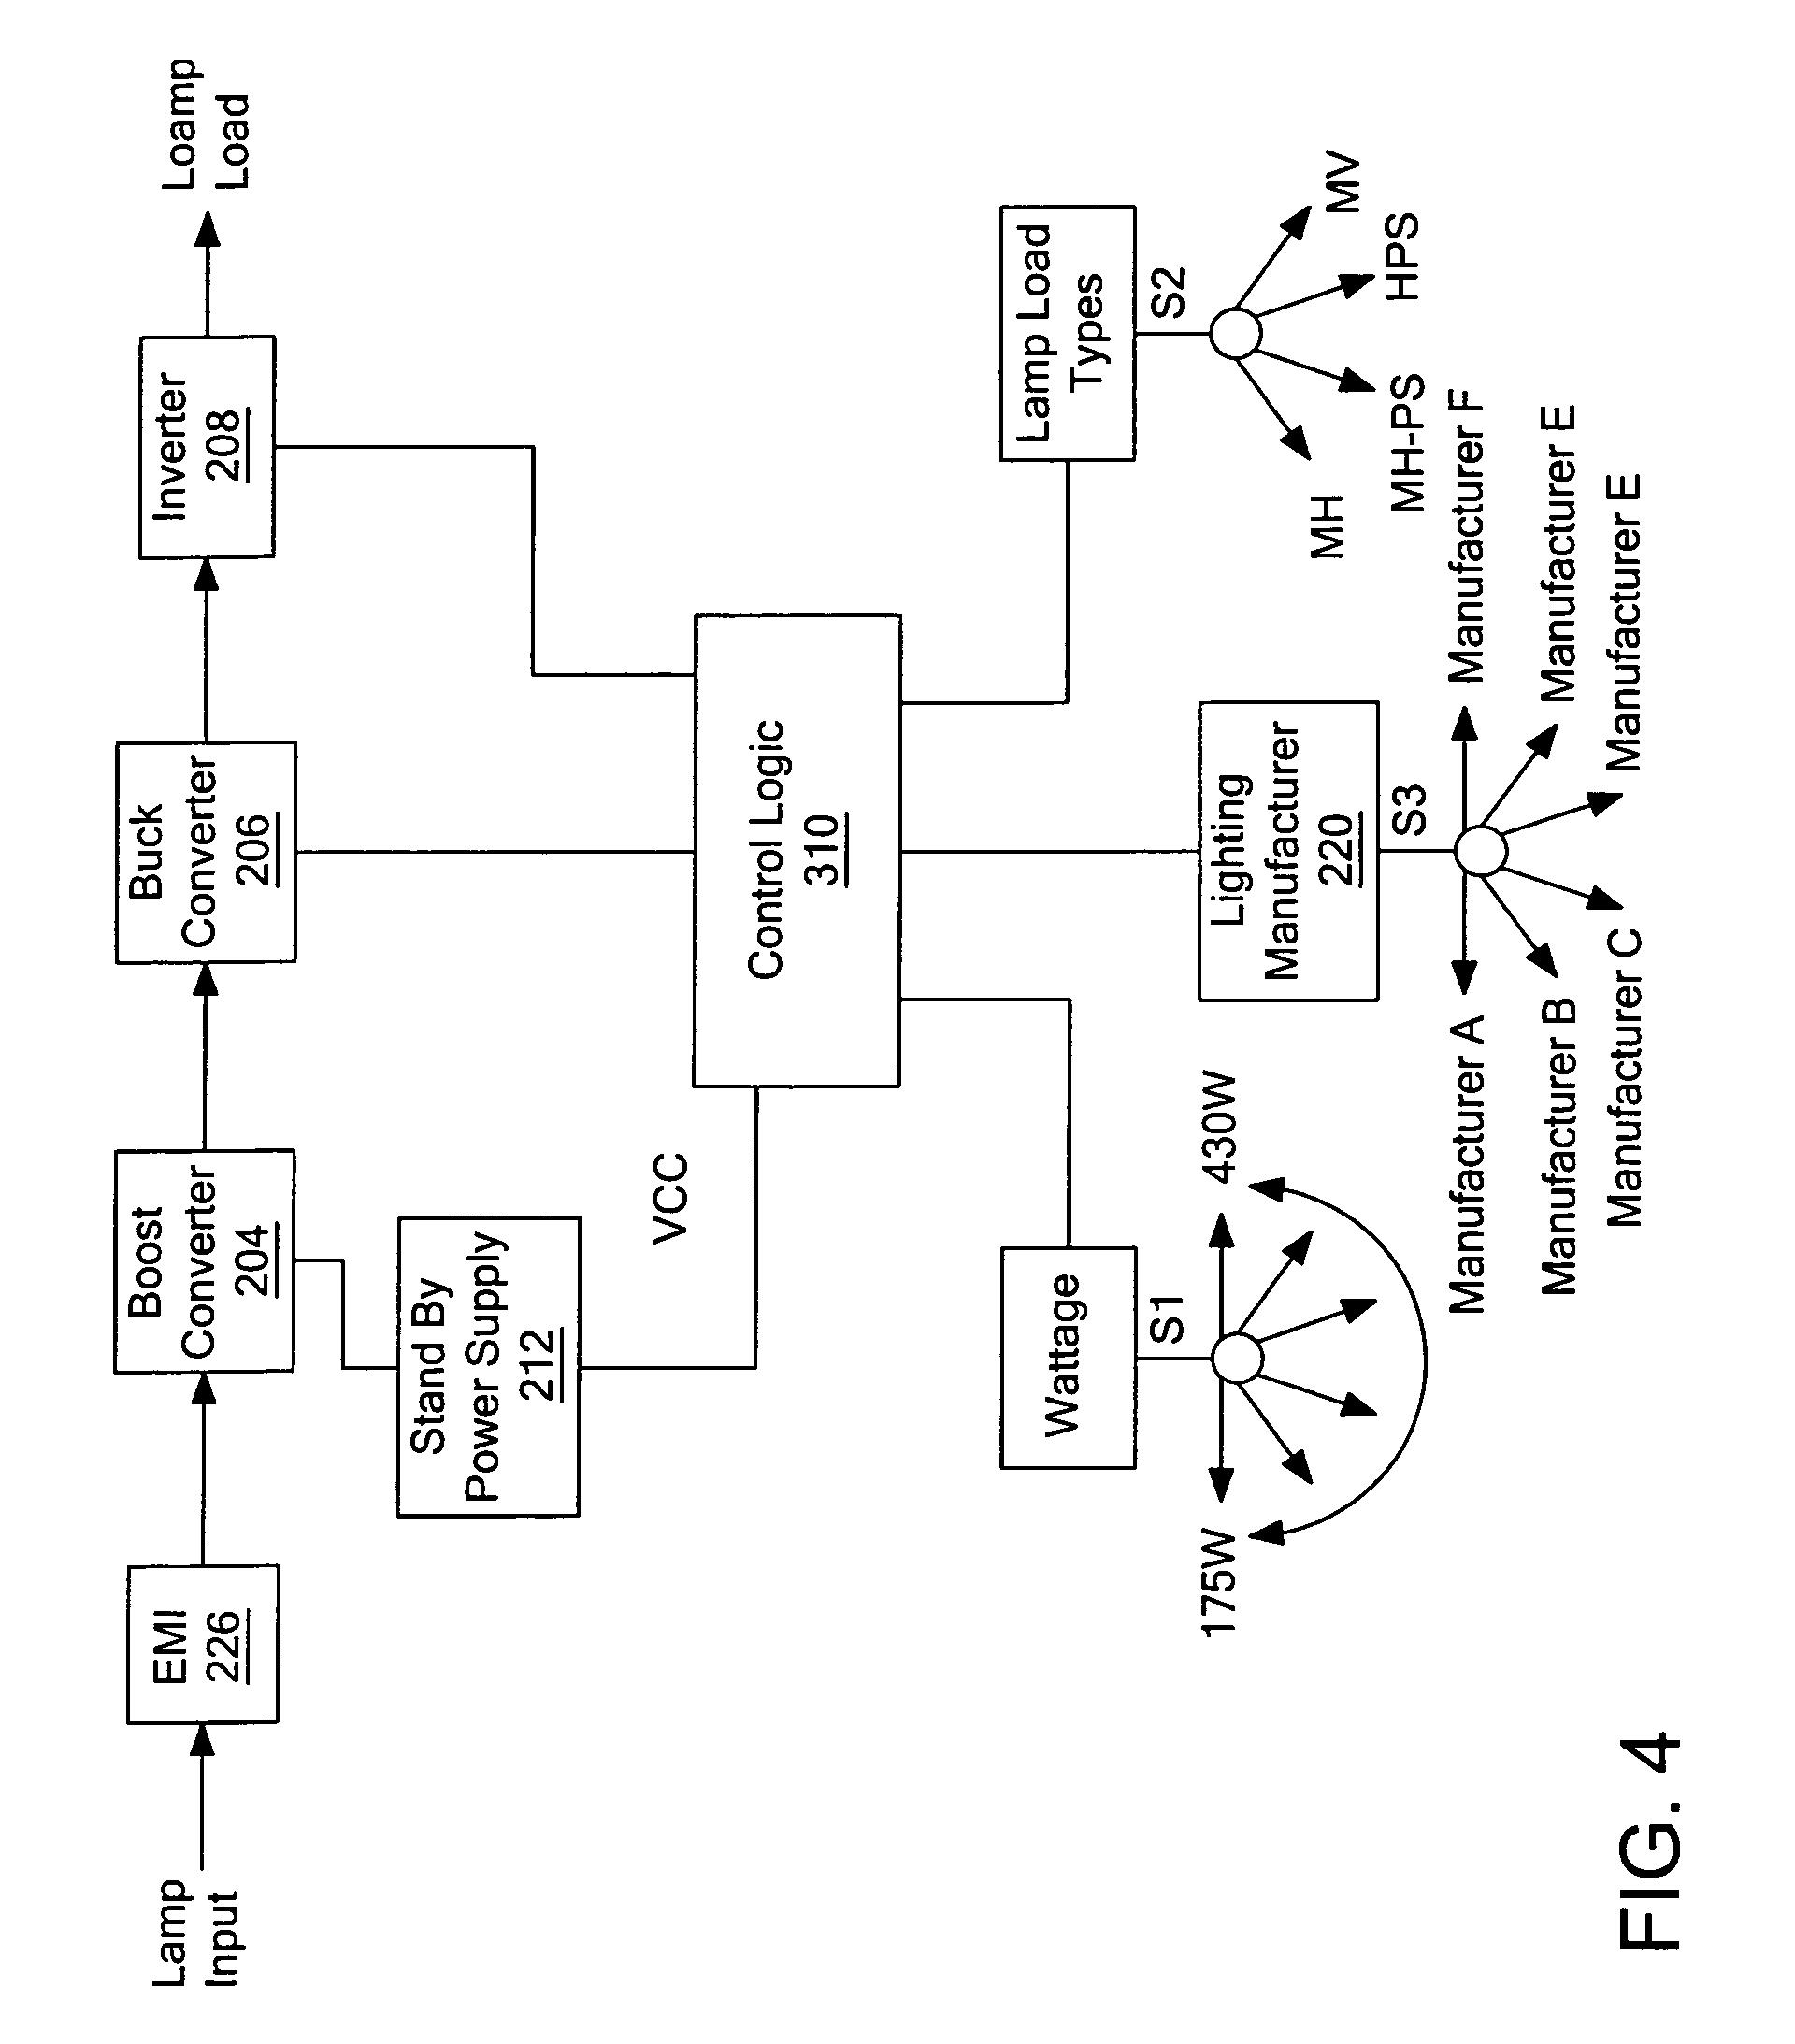 high pressure sodium ballast wiring diagram engine components circline